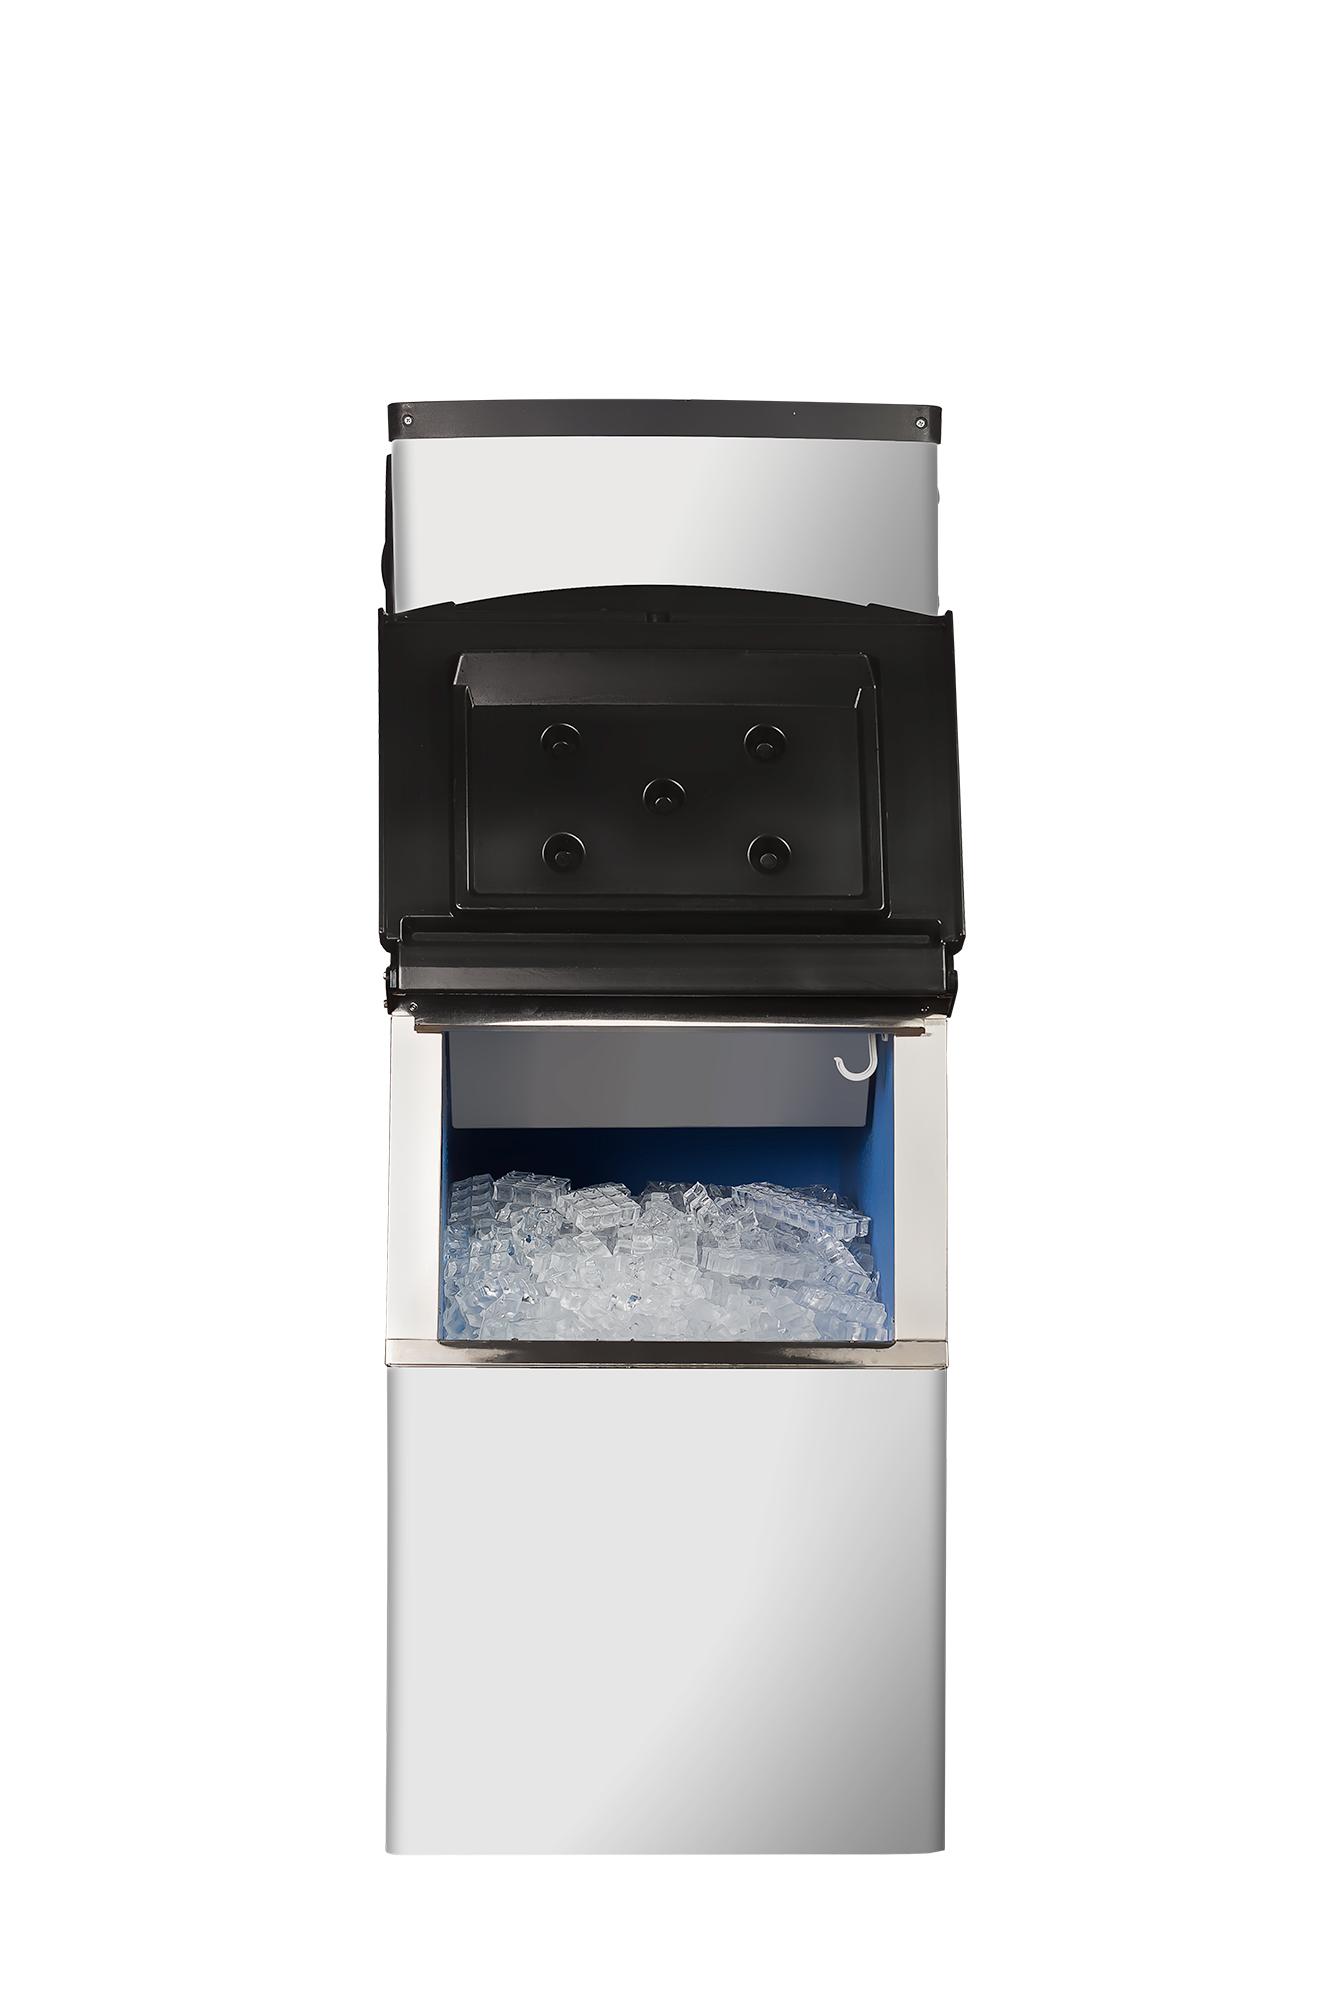 MÁQUINA DE GELO BENMAX SUPER ICE 160/90 KG SQUARE - 220V